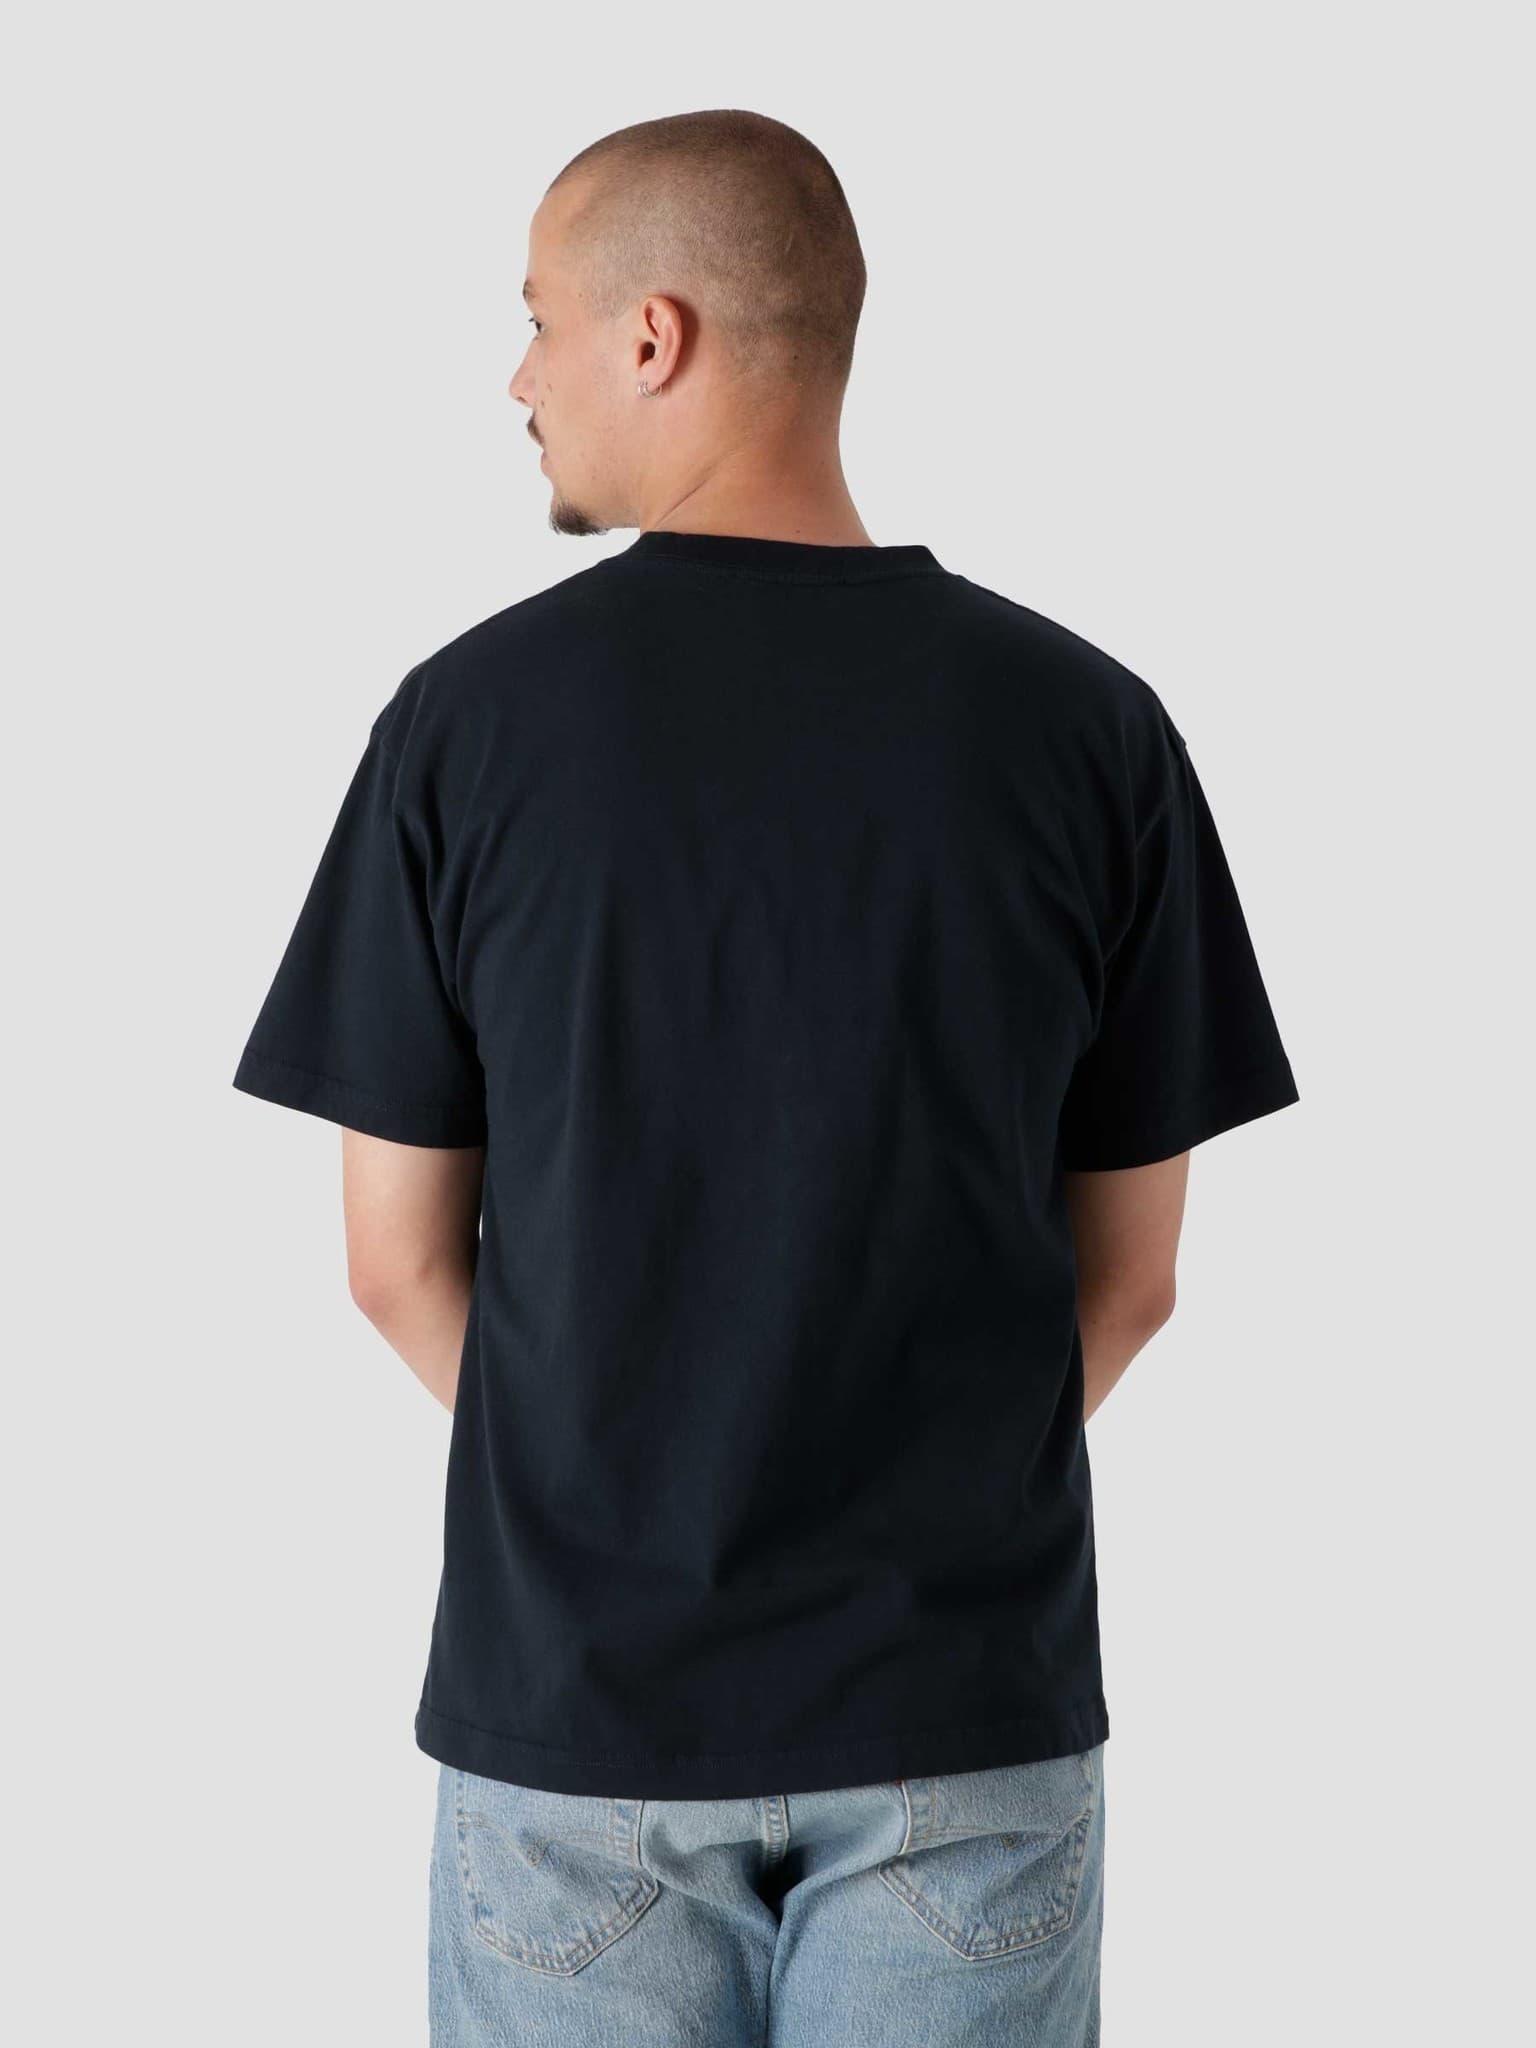 OLAF Uniform T-Shirt Navy